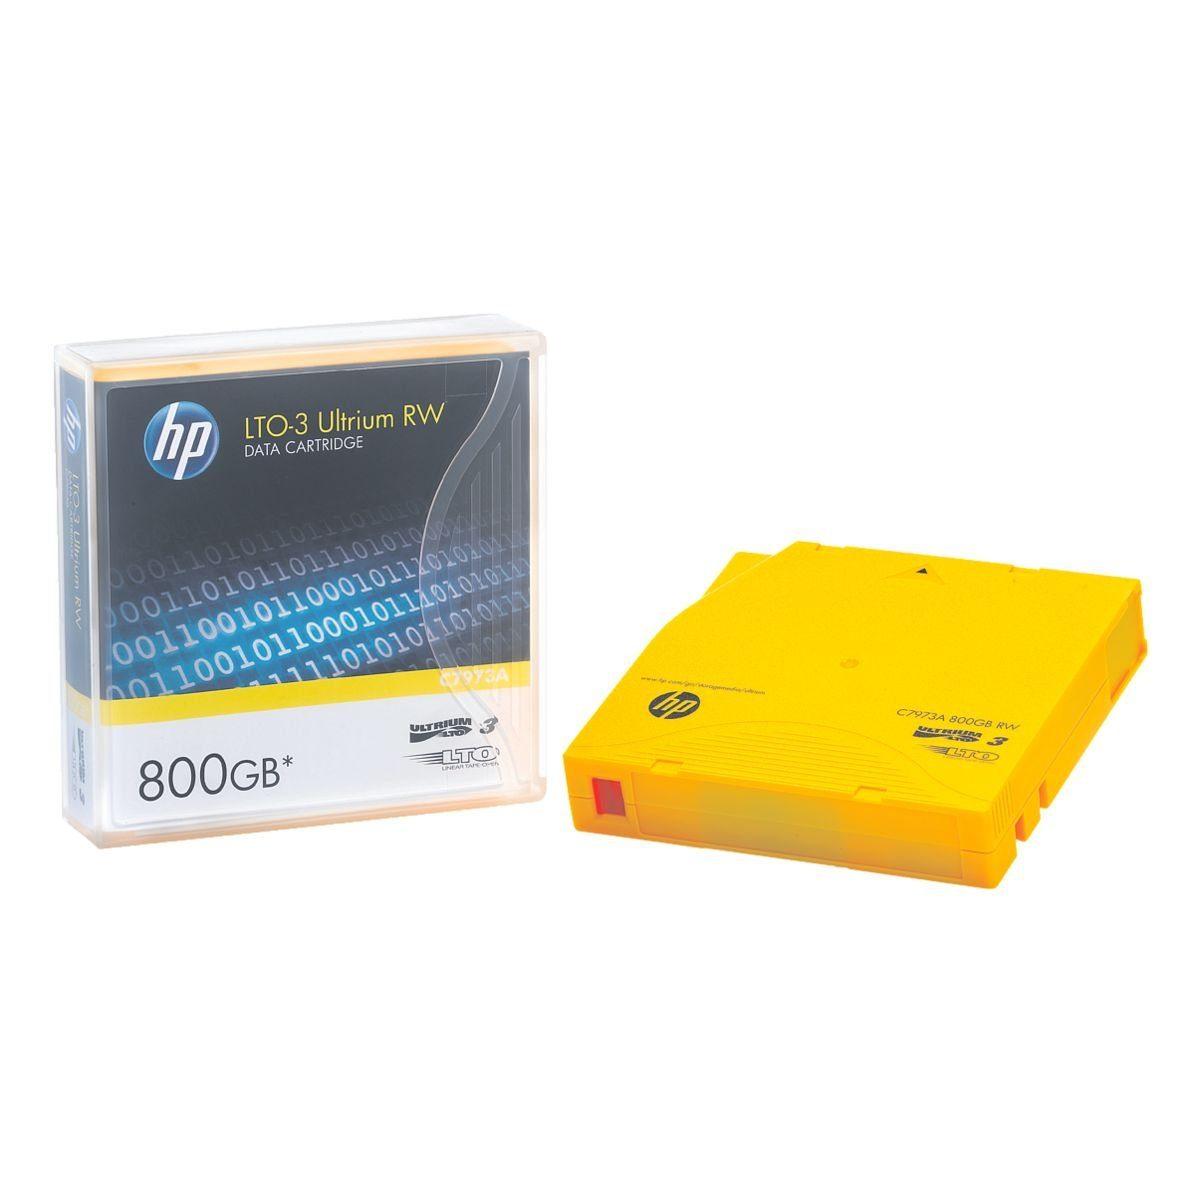 HP LTO Ultrium-Magnetband »HP Ultrium 3«